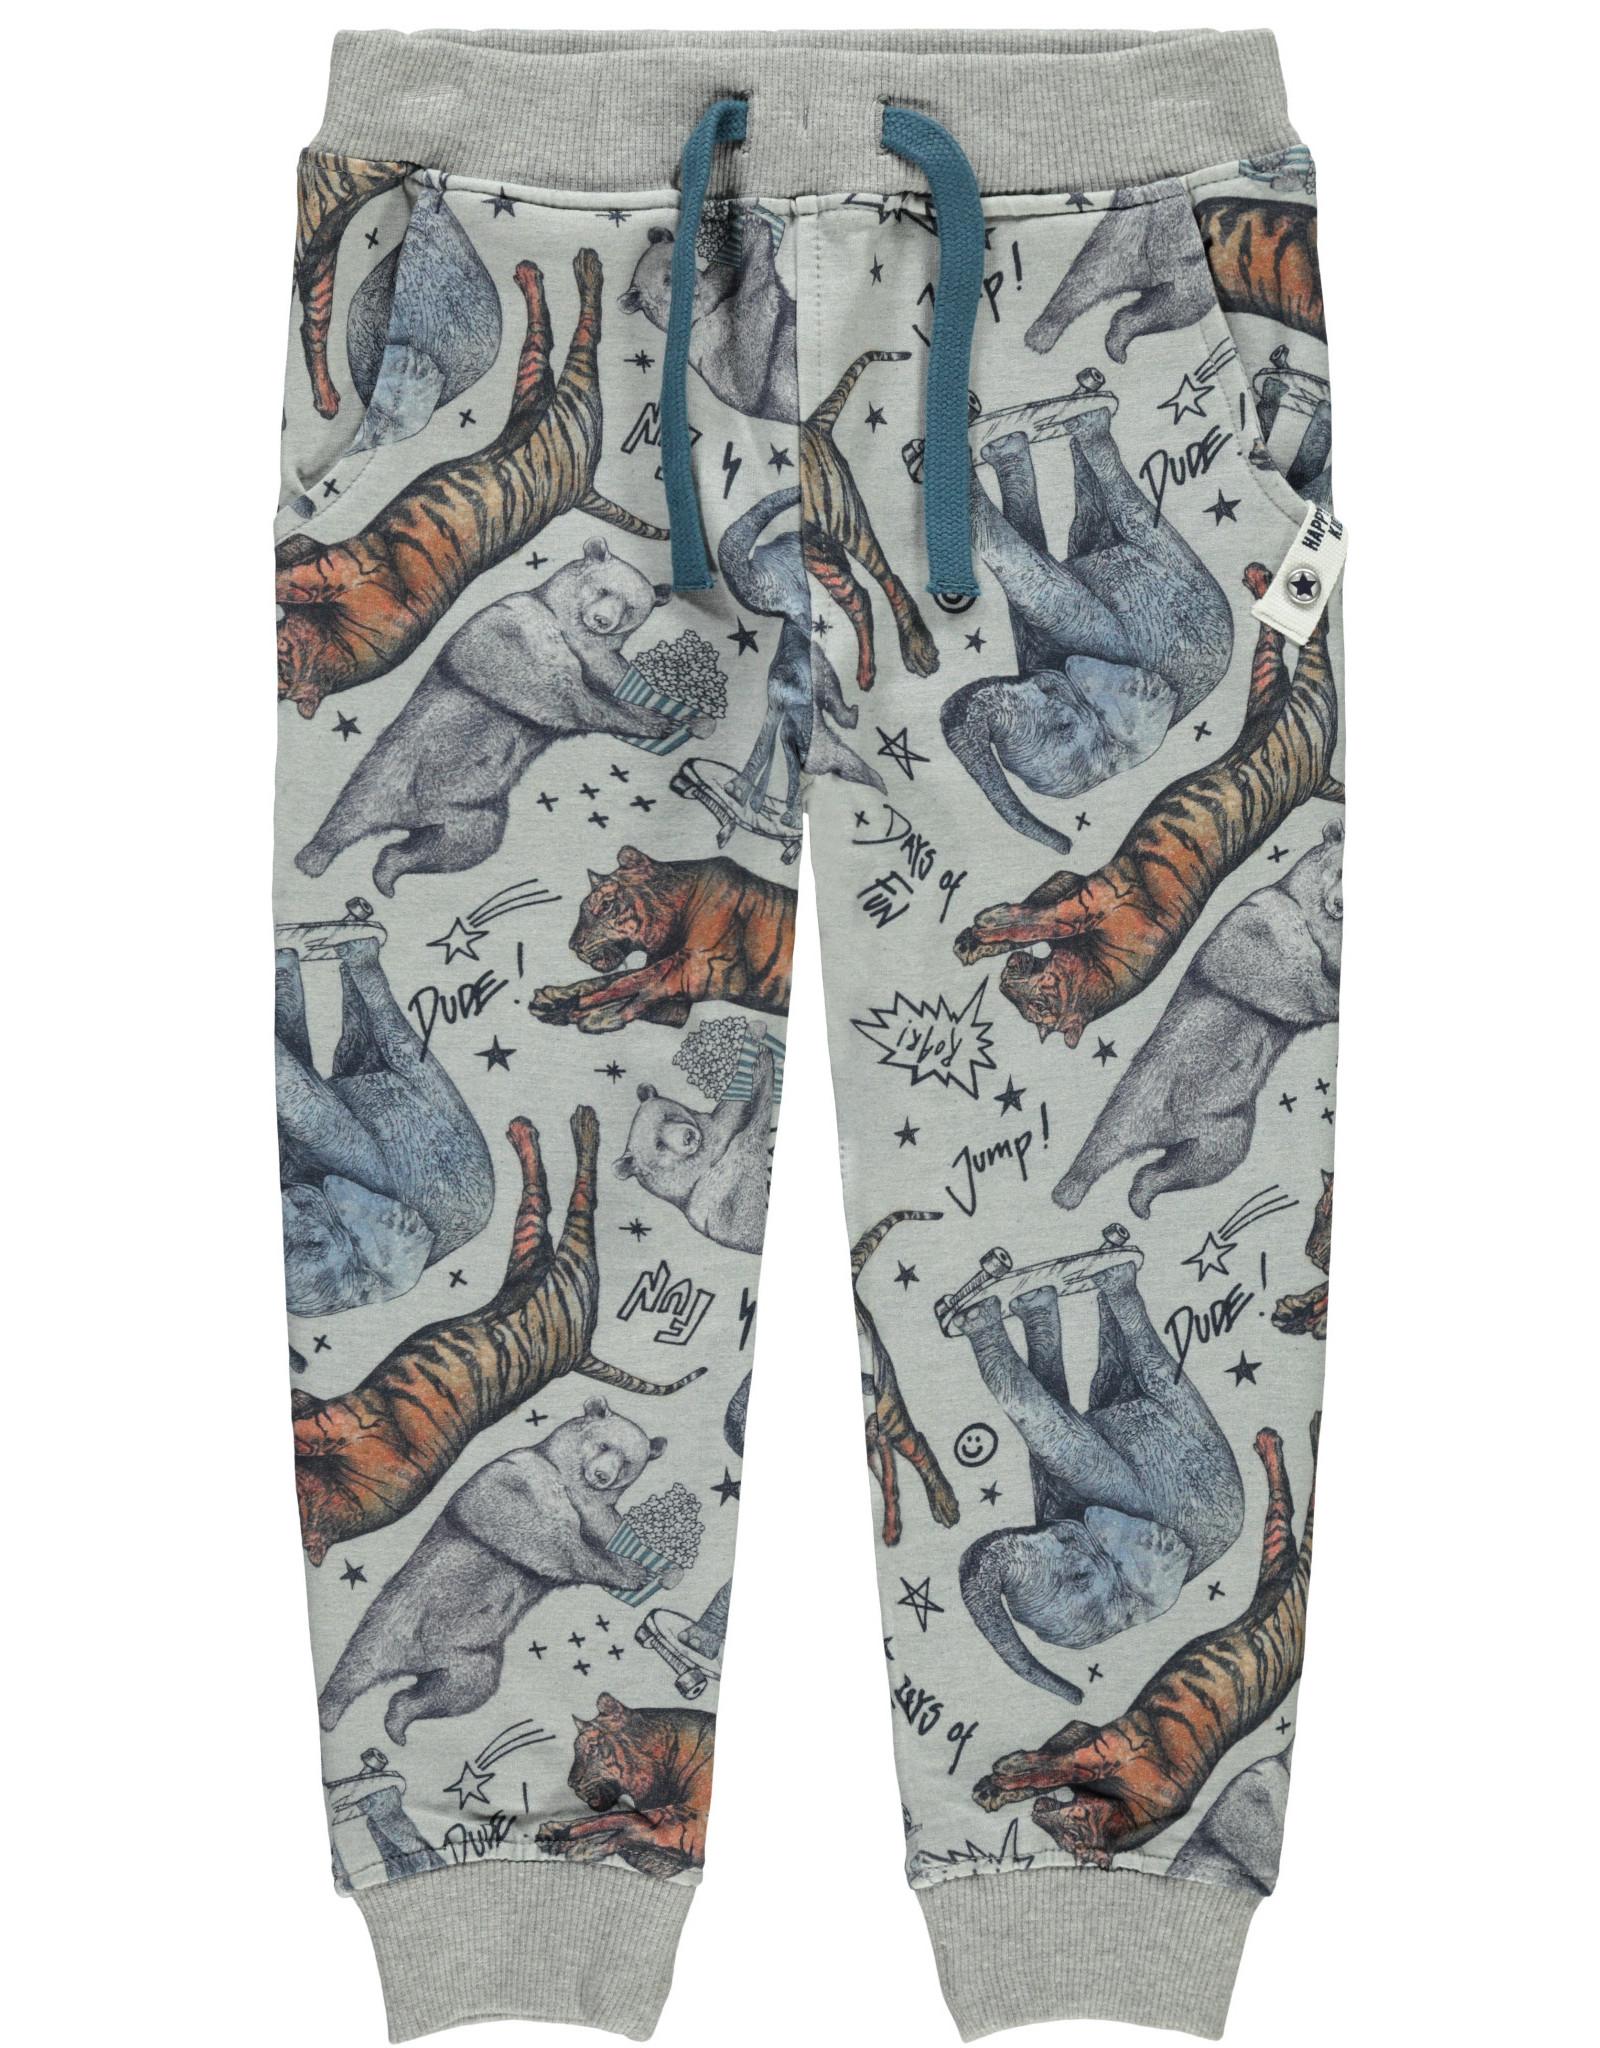 Name It Jogging broek met circus dieren print - LAATSTE MAAT 92